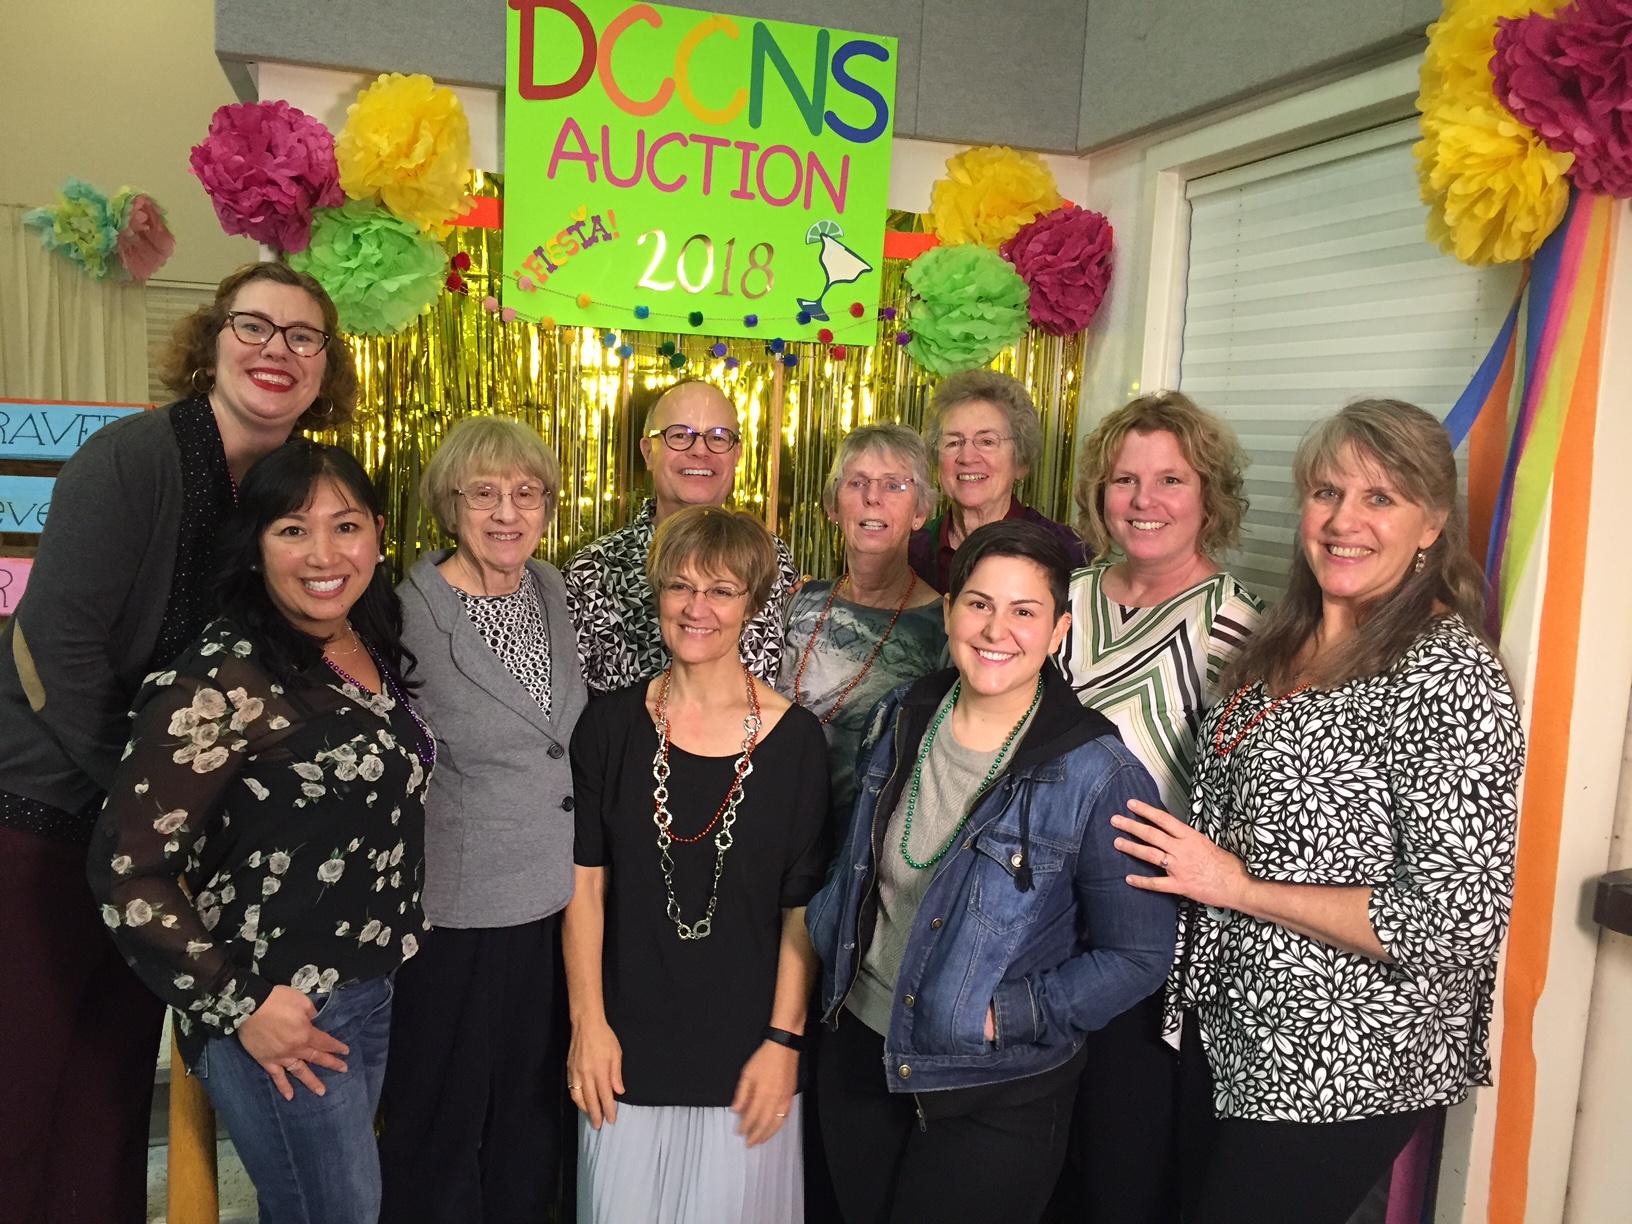 DCCNS' annual auction in 2018 celebrating decades of DCCNS teachers.